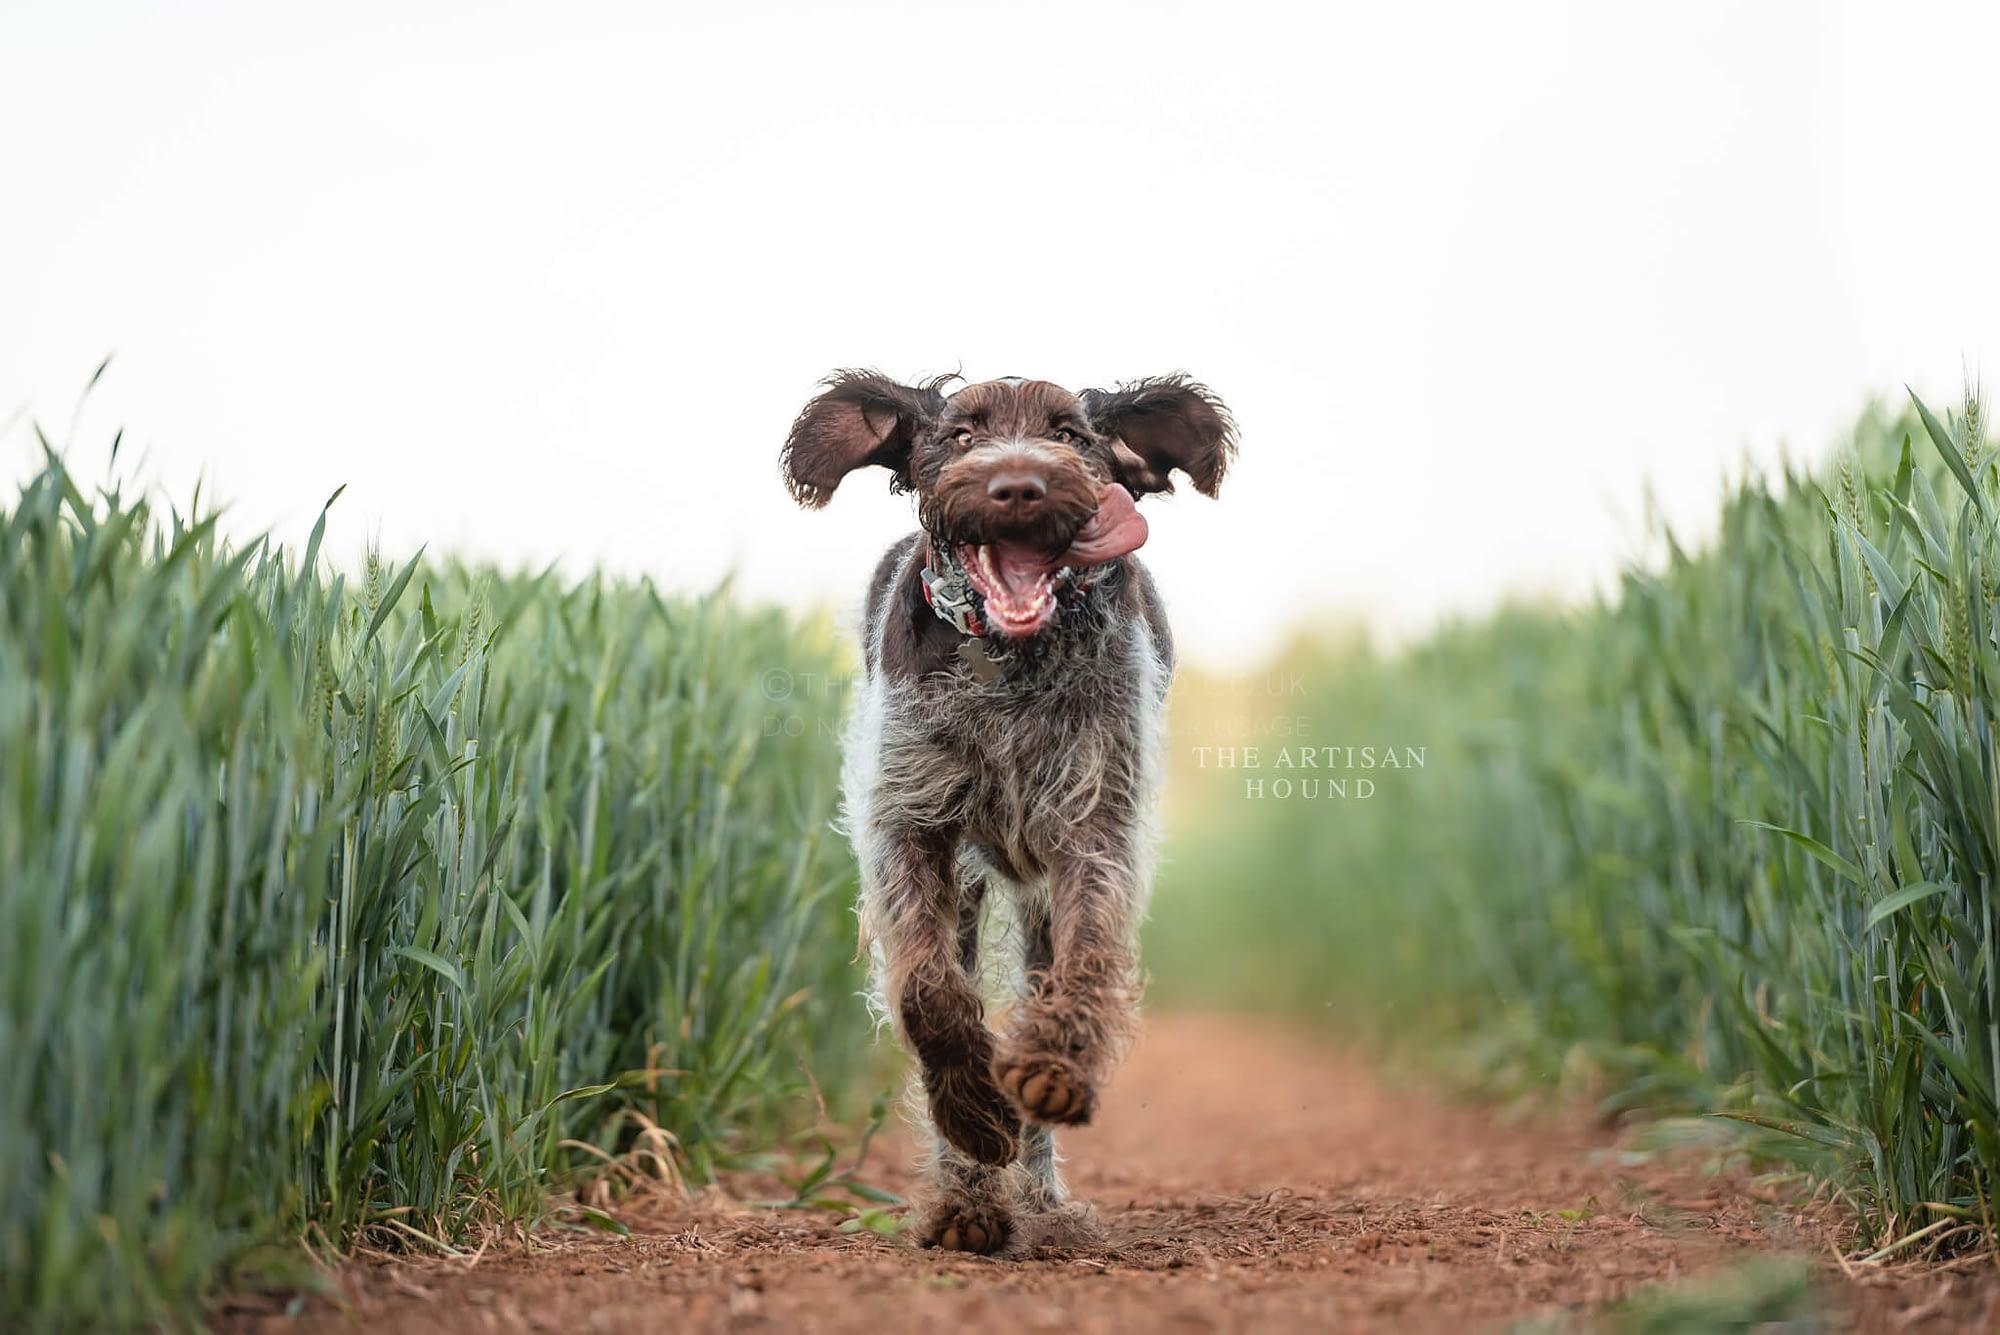 Young dog running through cornfield